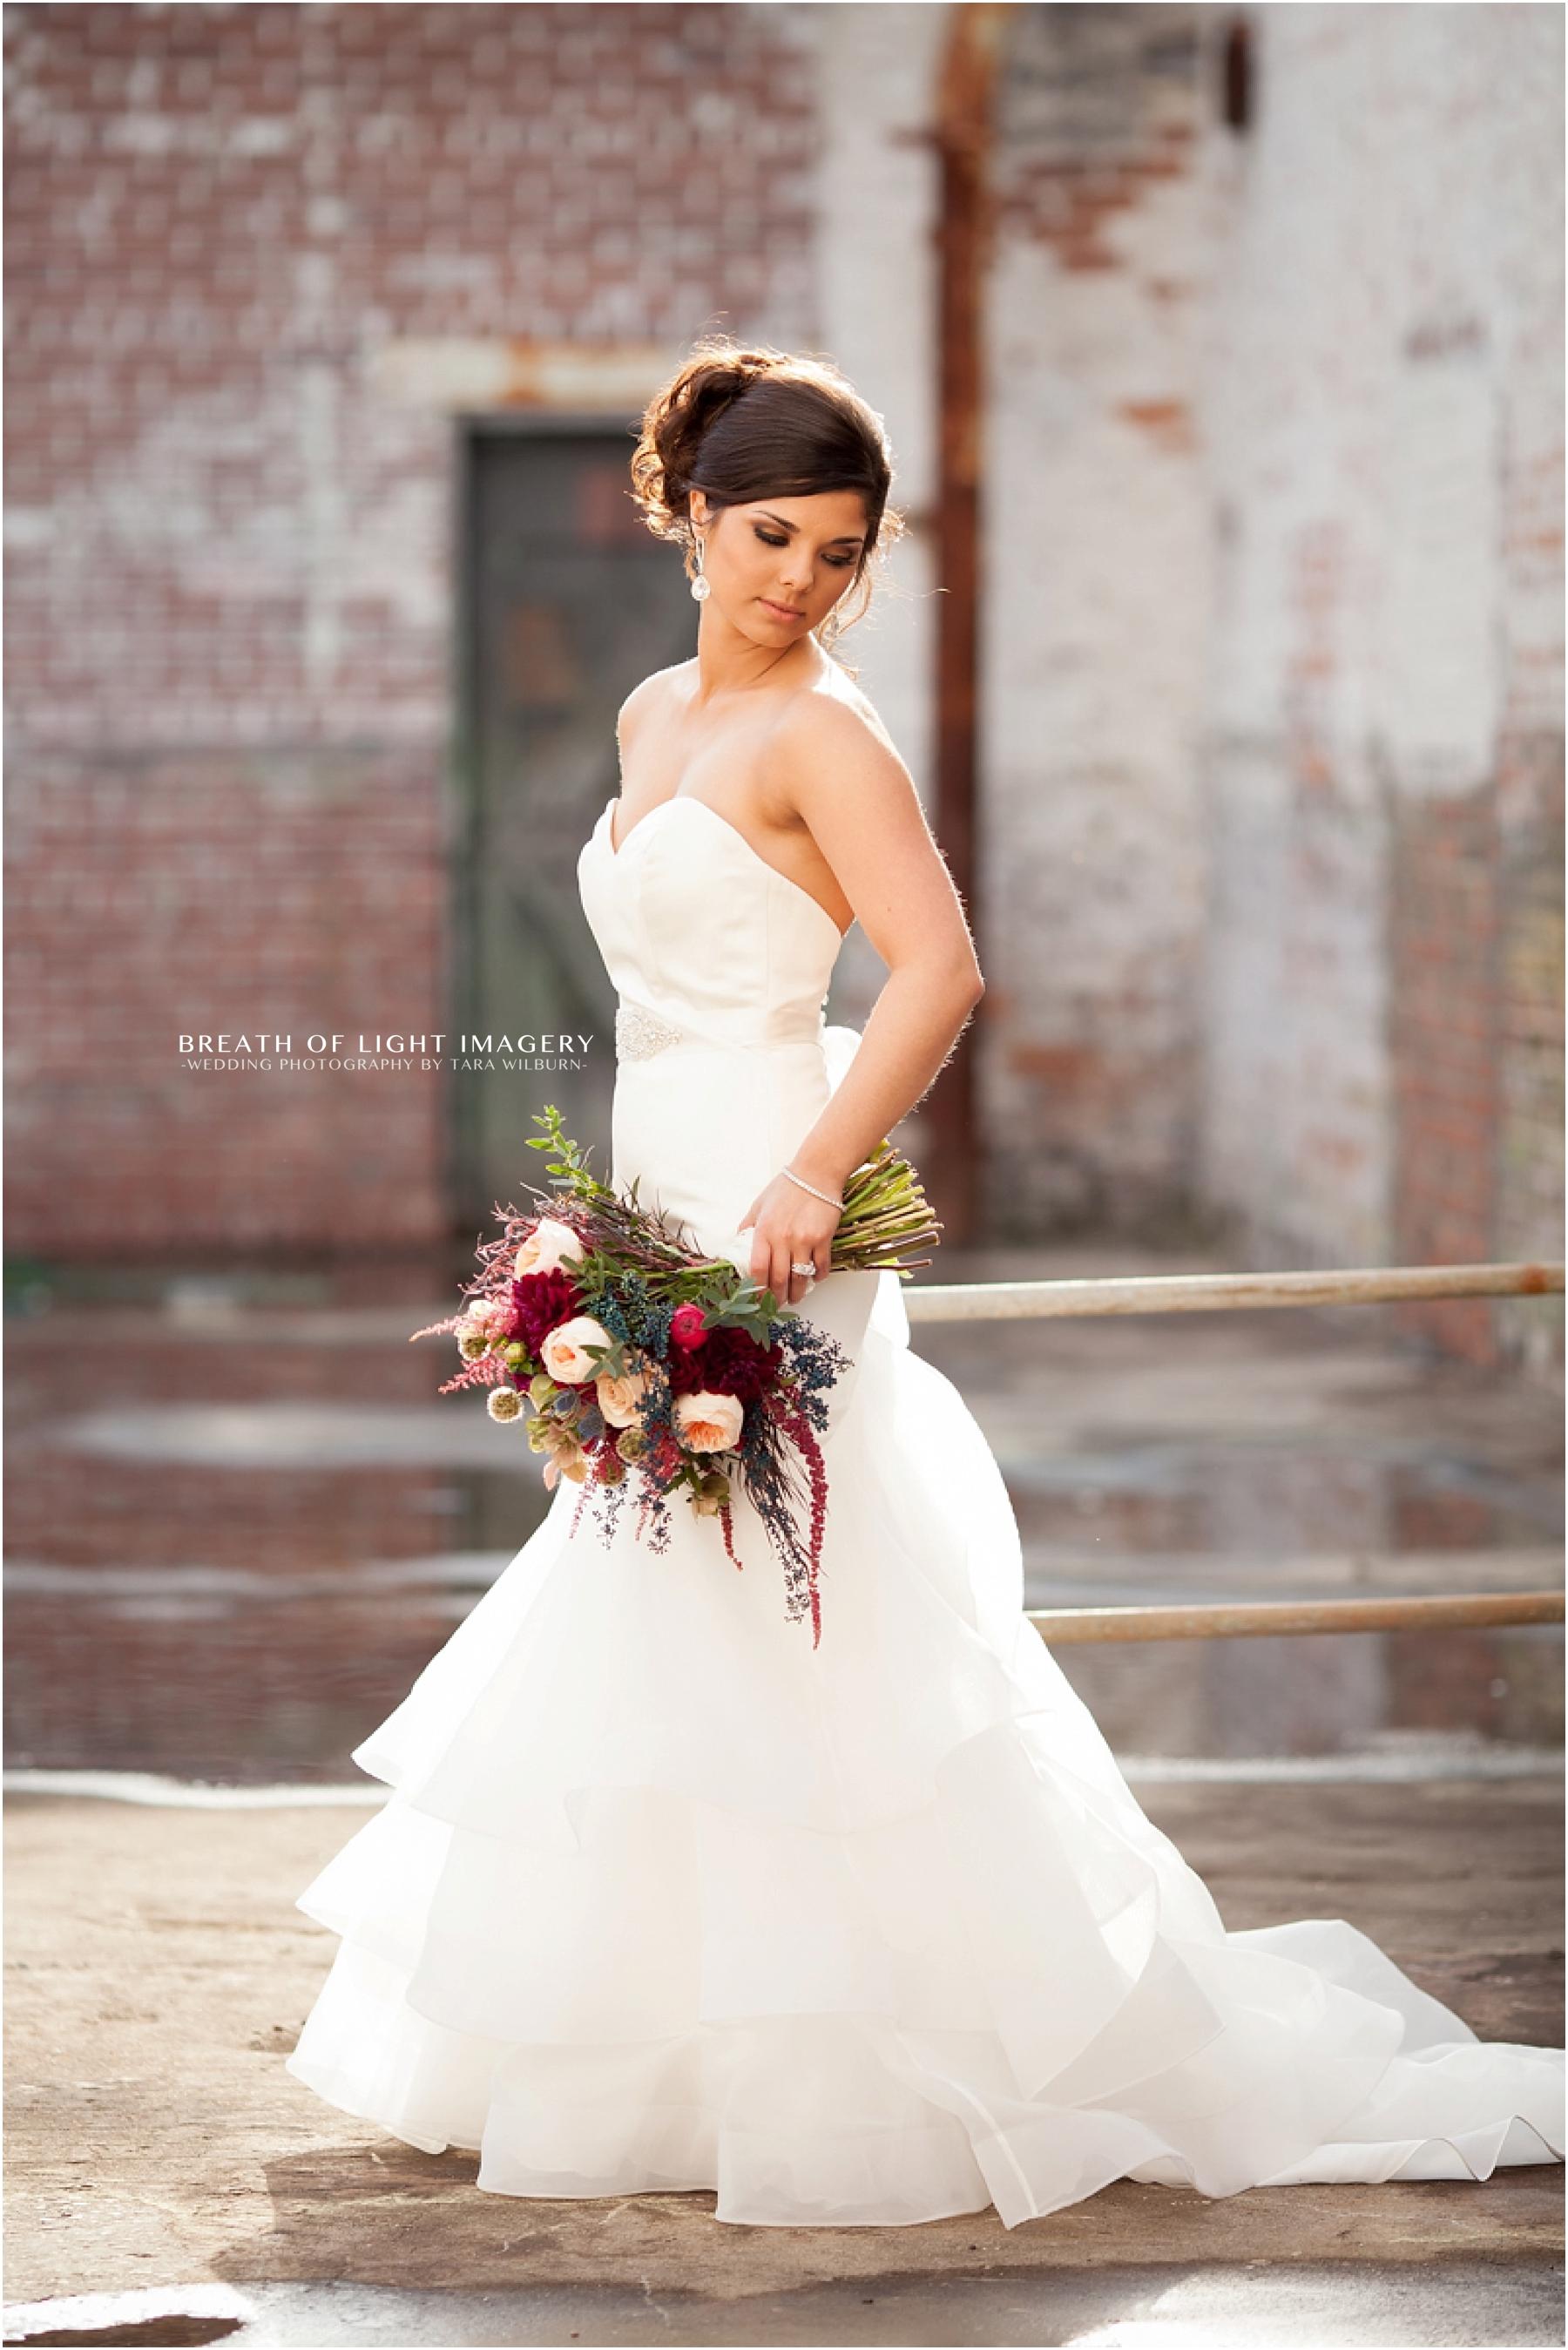 AKIN_wedding_03182017-406.jpg